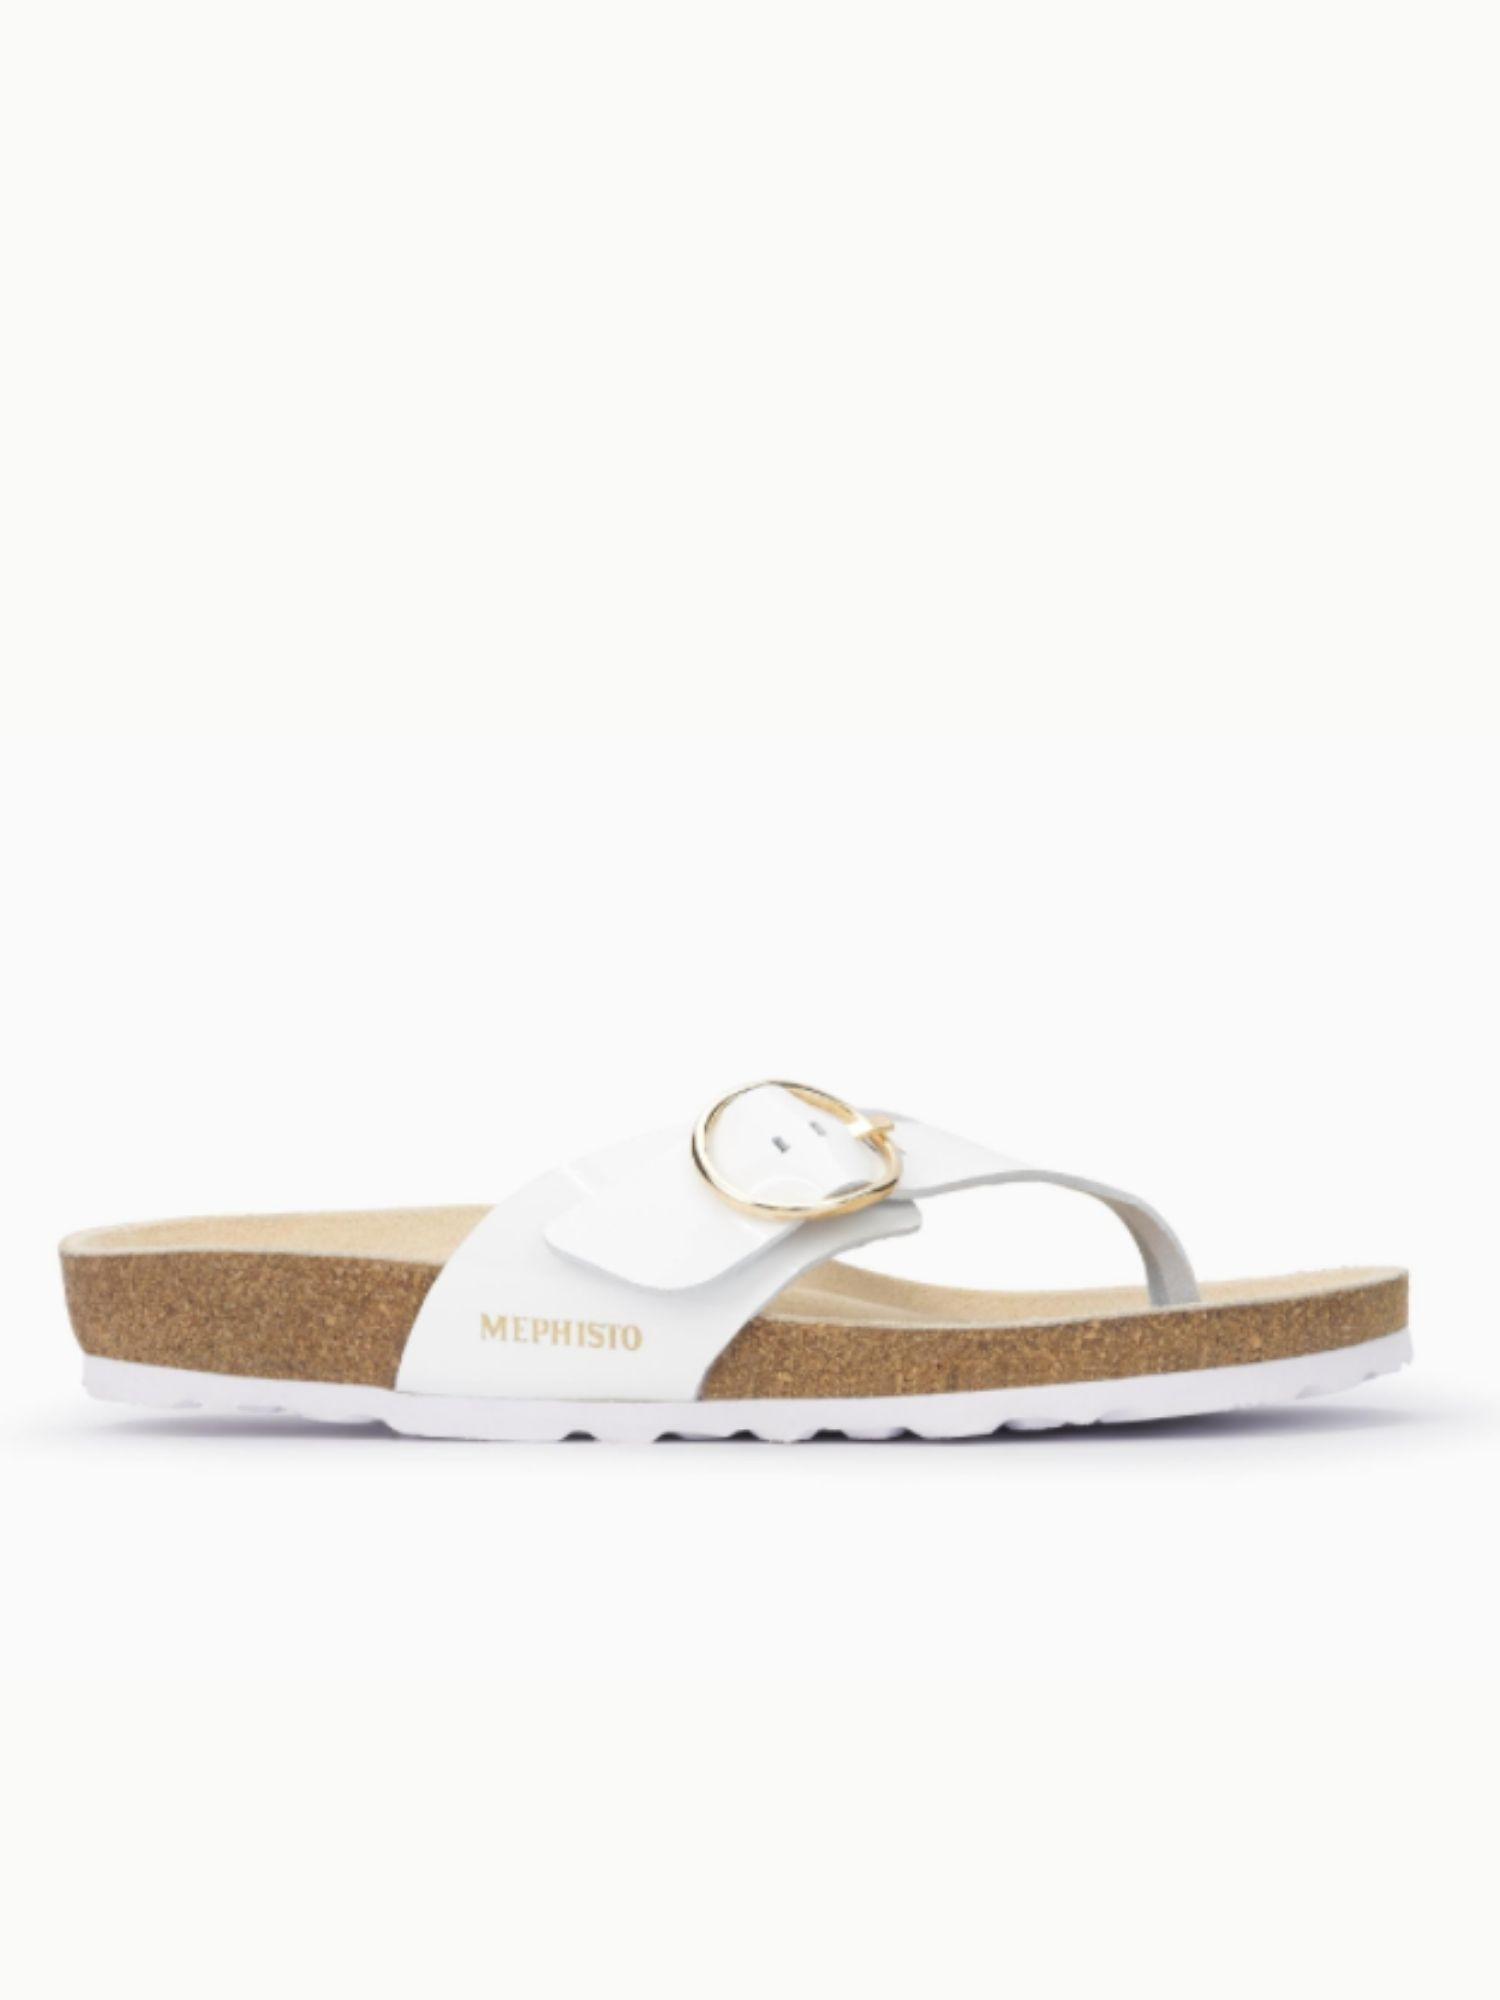 Sandalo Infradito Mephisto Natalina Bianco laterale